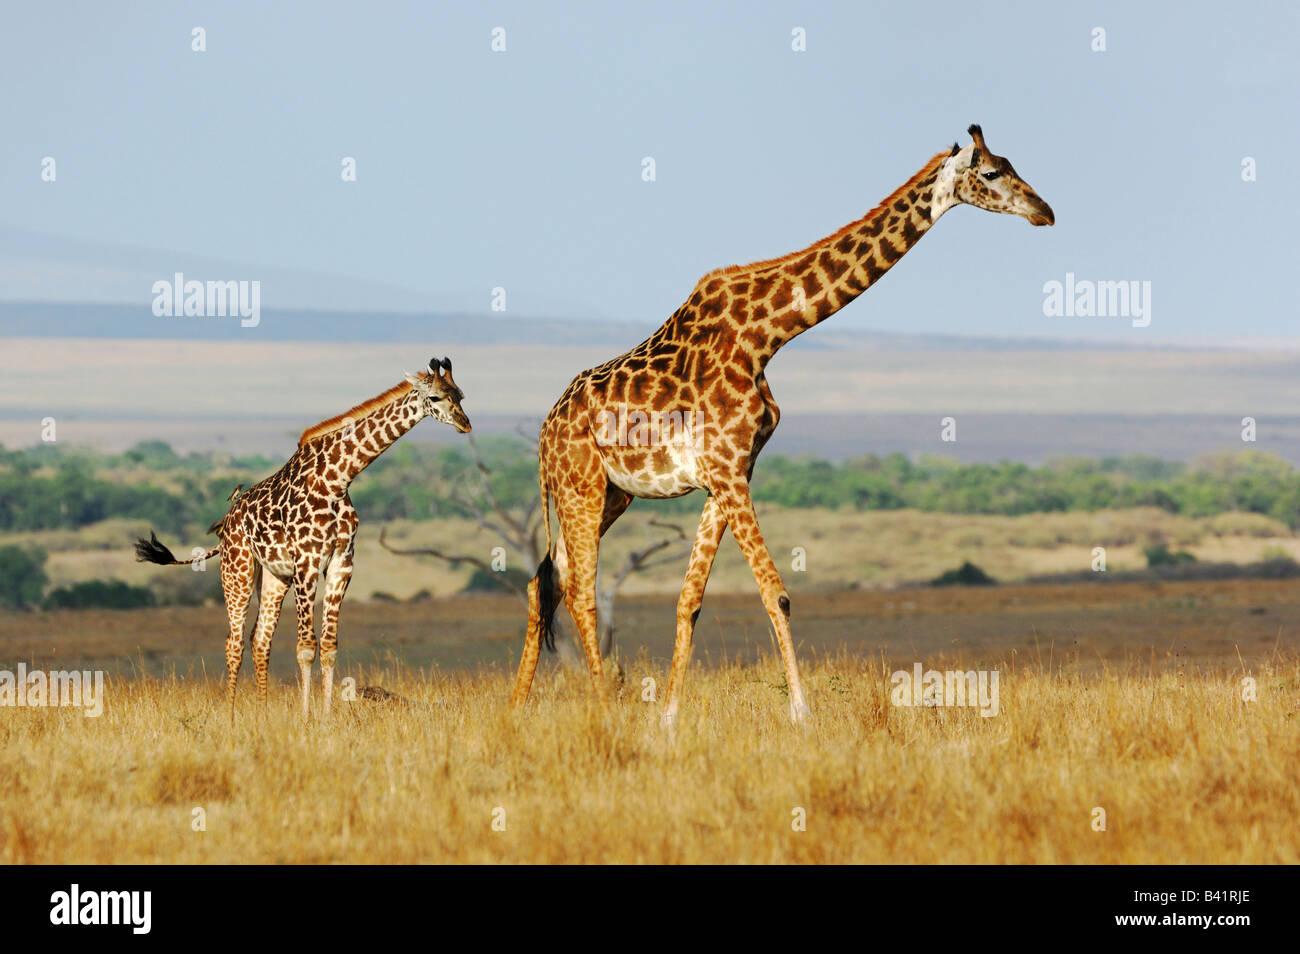 Masai Jirafa Giraffa camelopardalis tippelskirchi hembra con jóvenes Masai Mara Kenia África Imagen De Stock